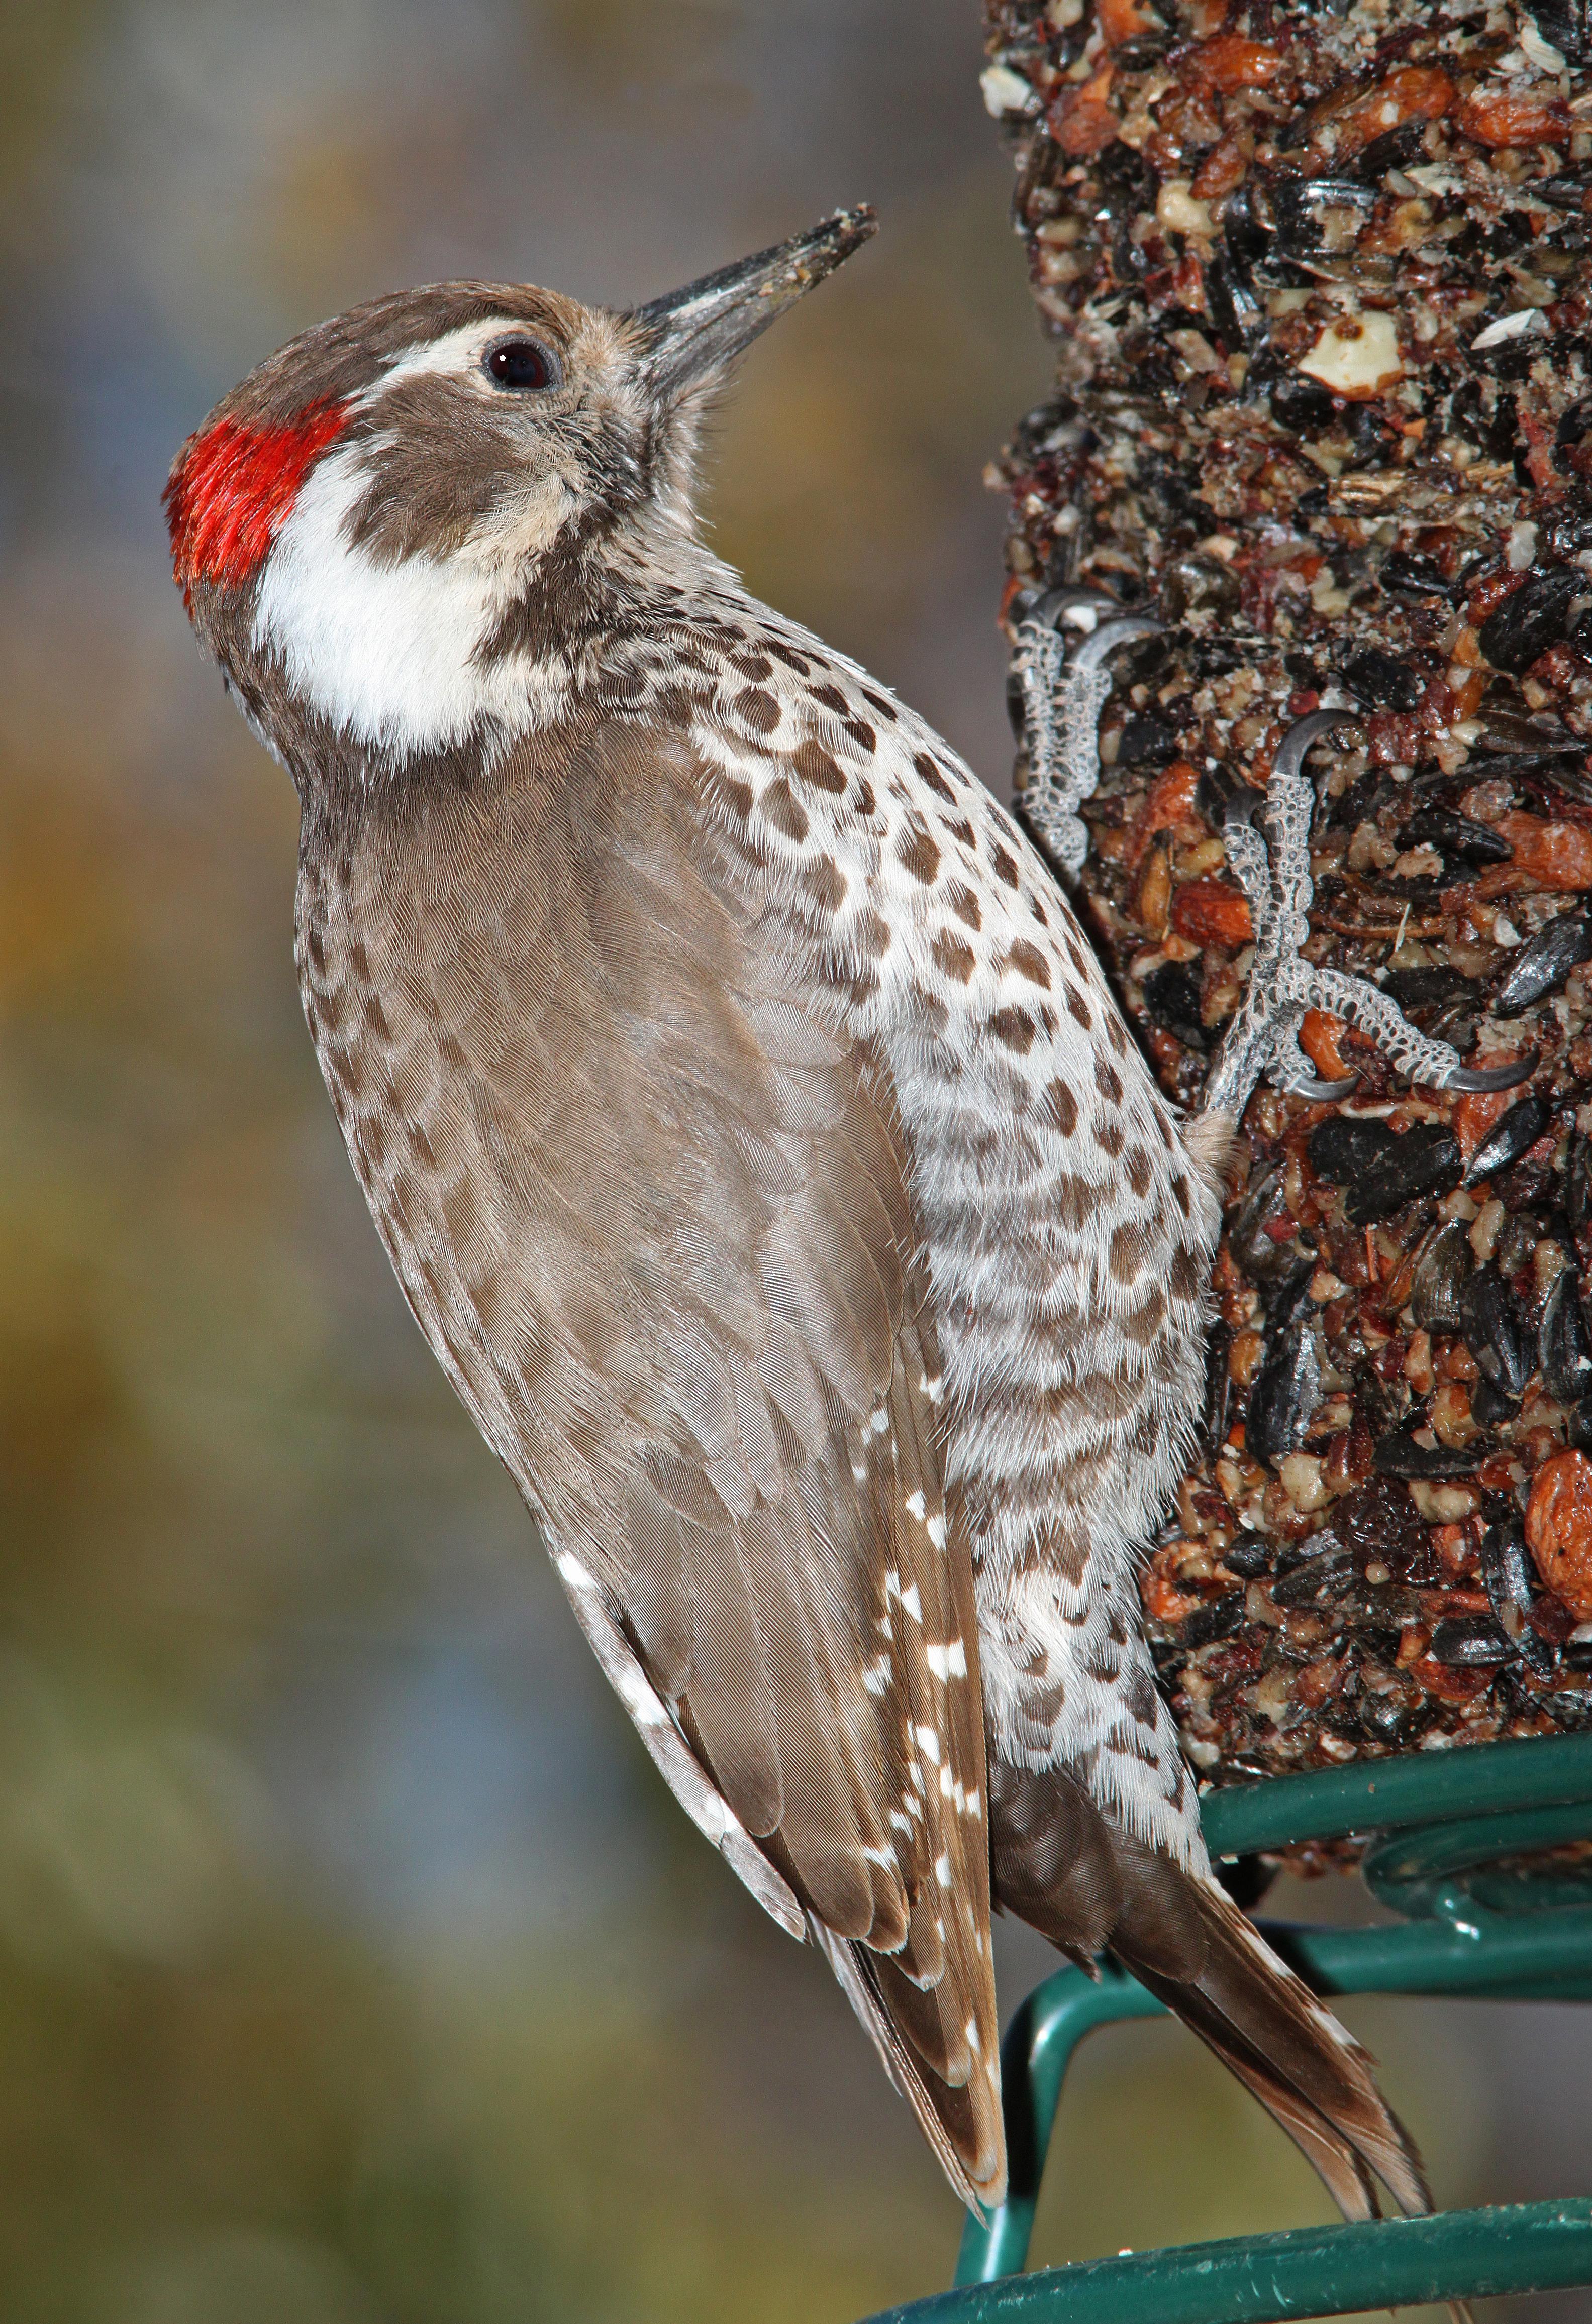 537 - arizona woodpecker (3-23-11) sierra vista, cochise co, az (1) photo